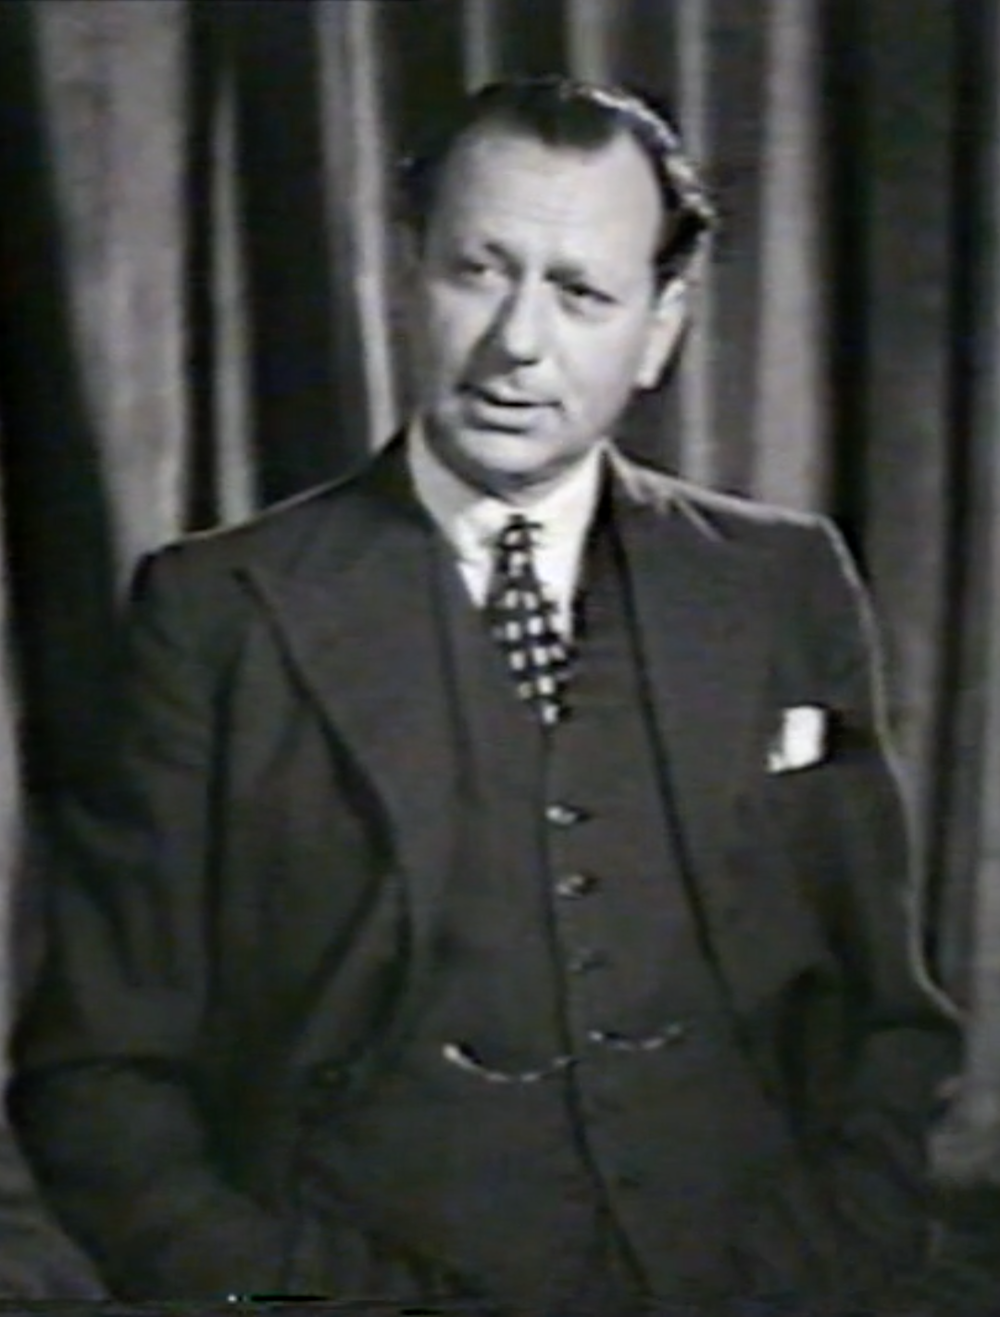 Still from a film of Montagu Marks speaking on Cinesound Review, Australia December 1937